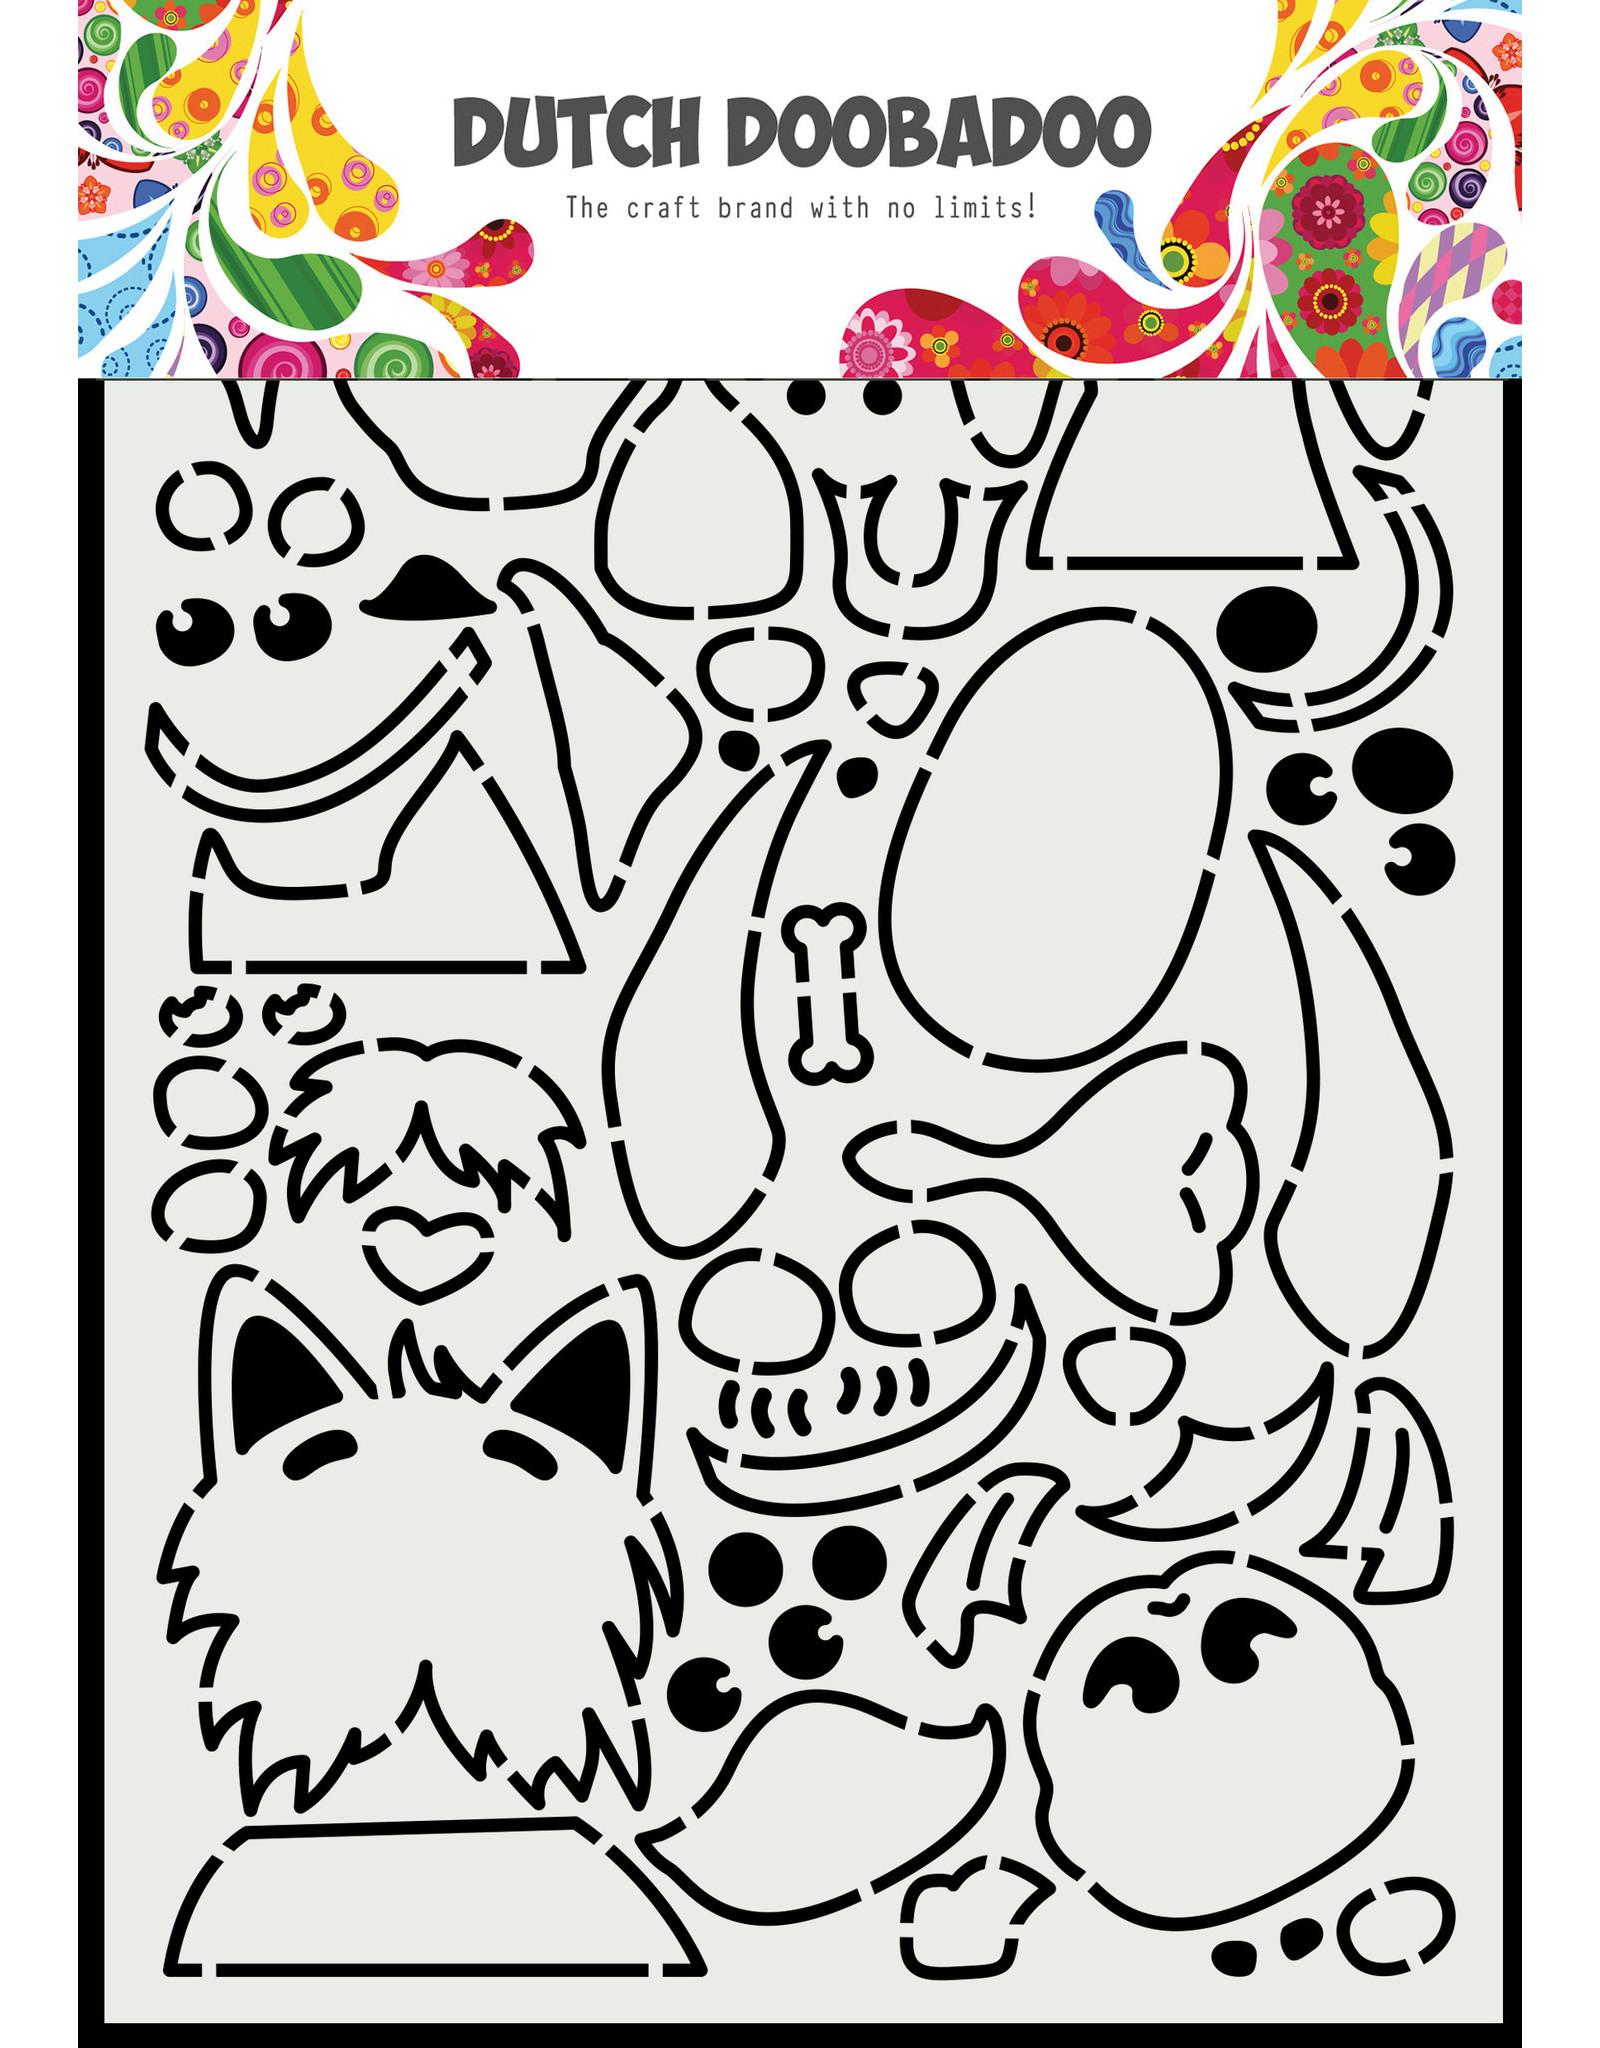 Dutch Doobadoo DDBD Card Art A5 Peek a boo hondjes